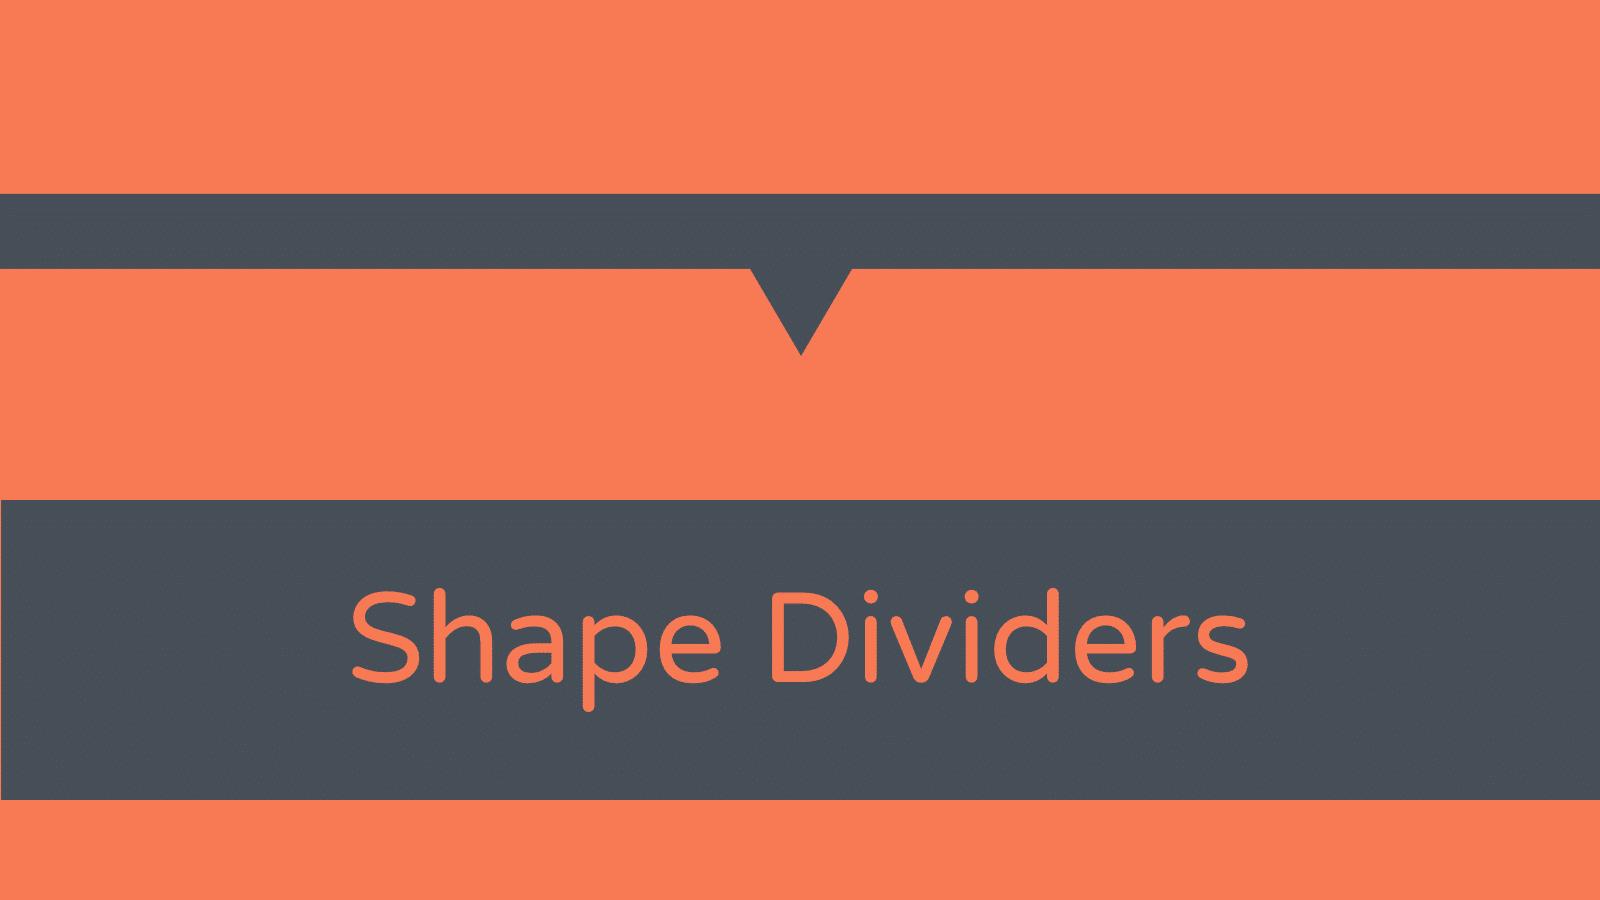 Divi Theme Shape Dividers: Übergänge gestalten